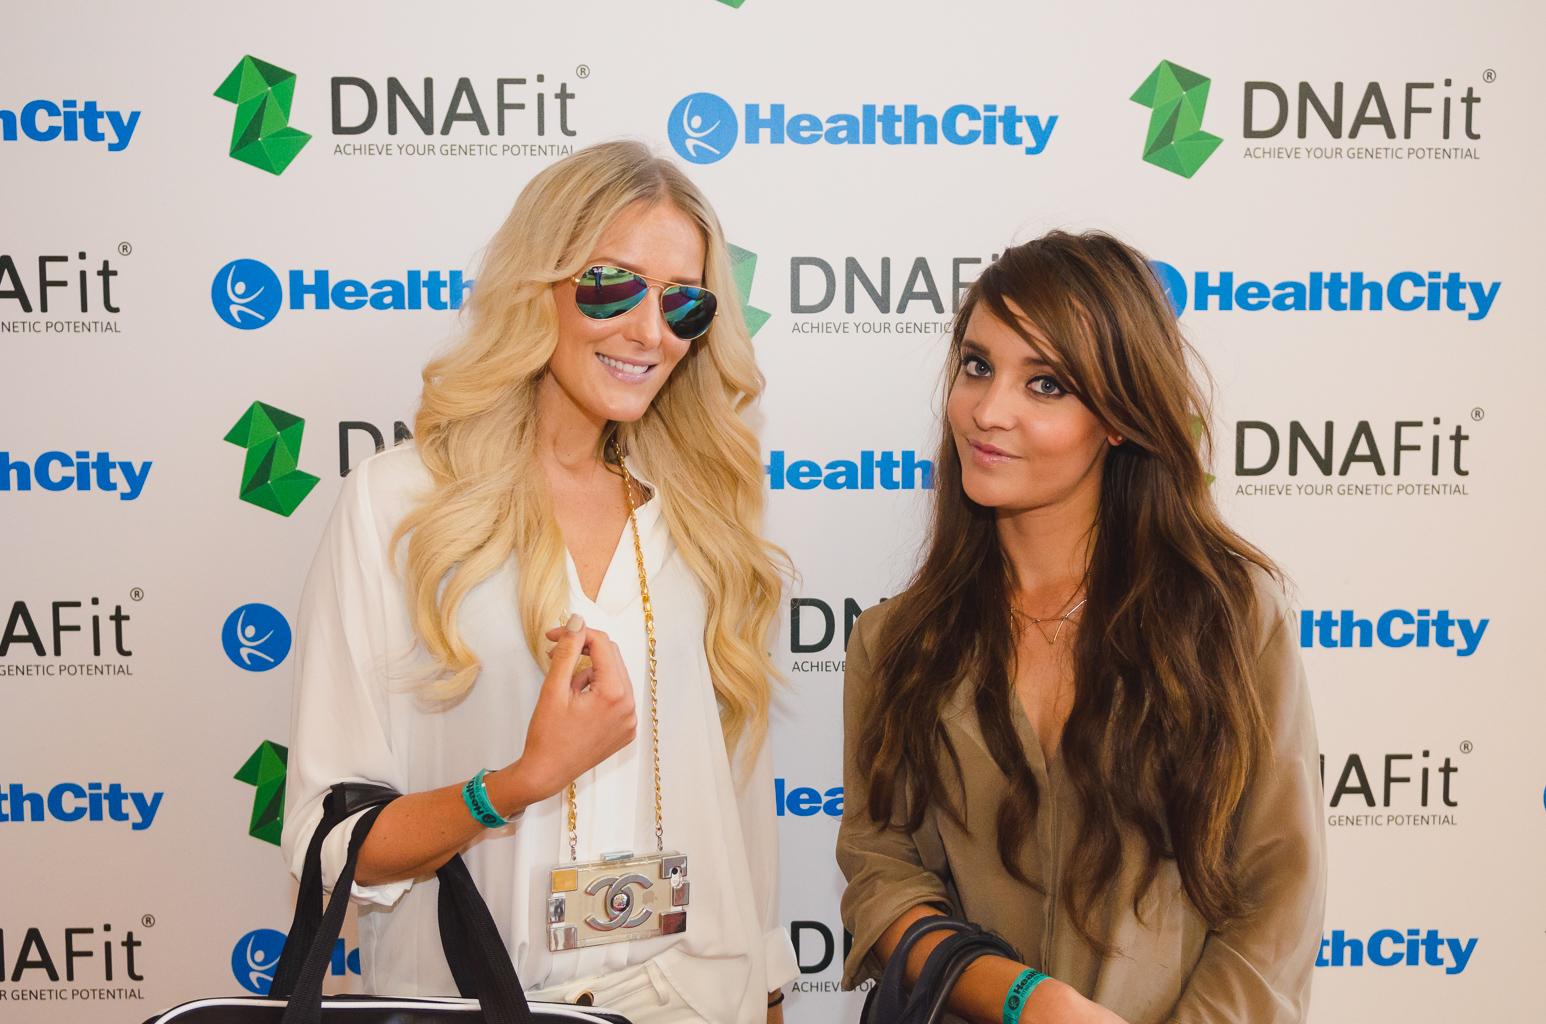 20140917 Healthcity DNAFit-013